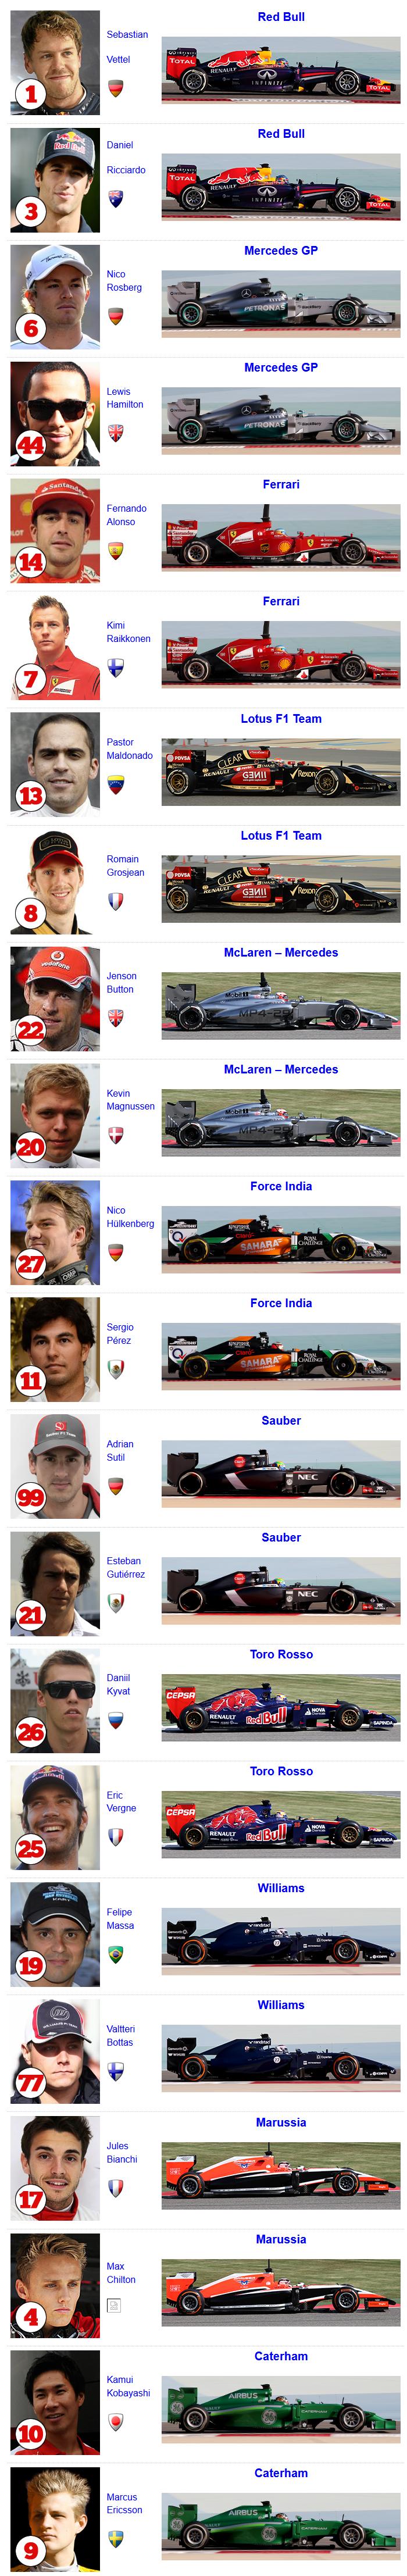 Echipe si piloti Formula 1 2014